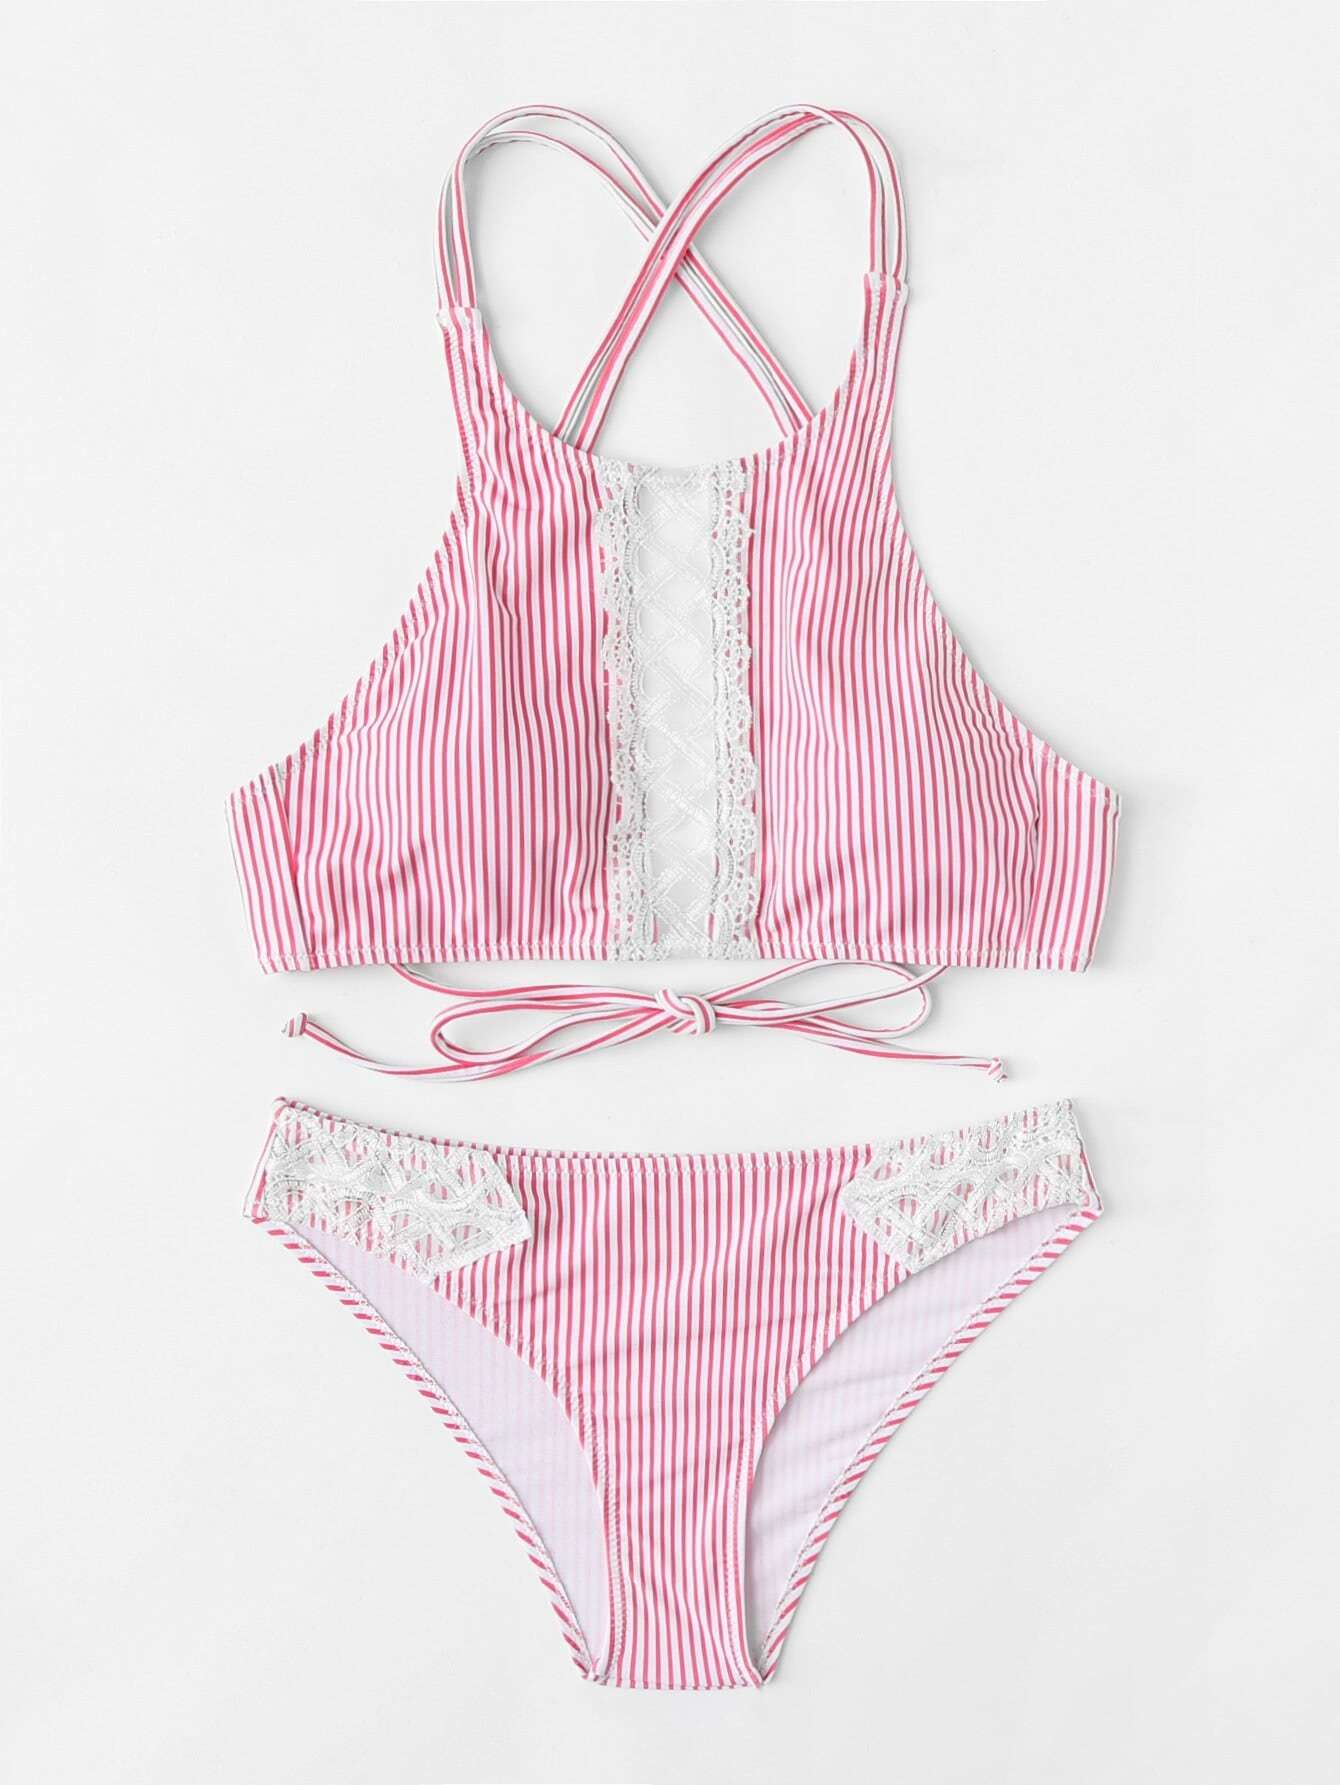 Contrast Lace Striped Bikini Set contrast lace high neck bikini set